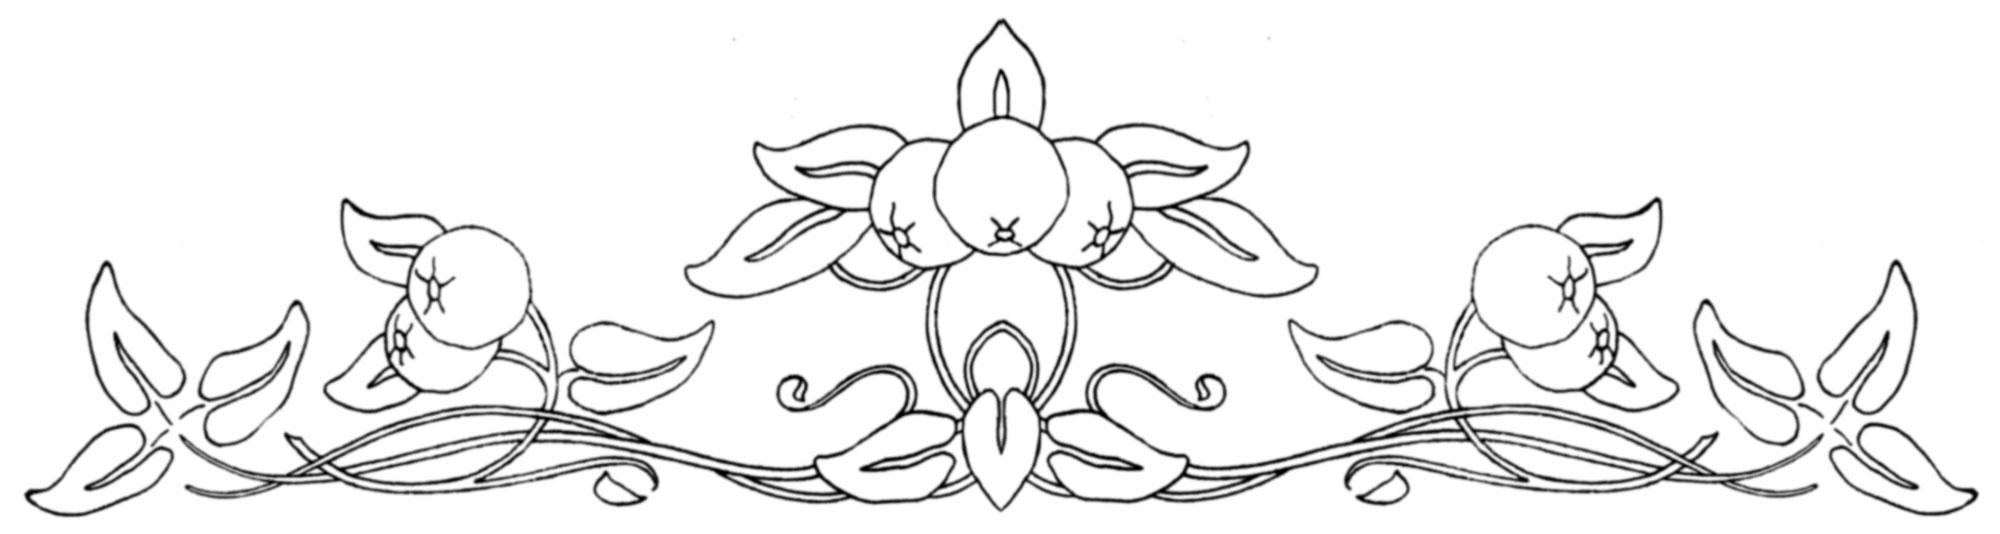 pillowcase-embroidery-transfer-1